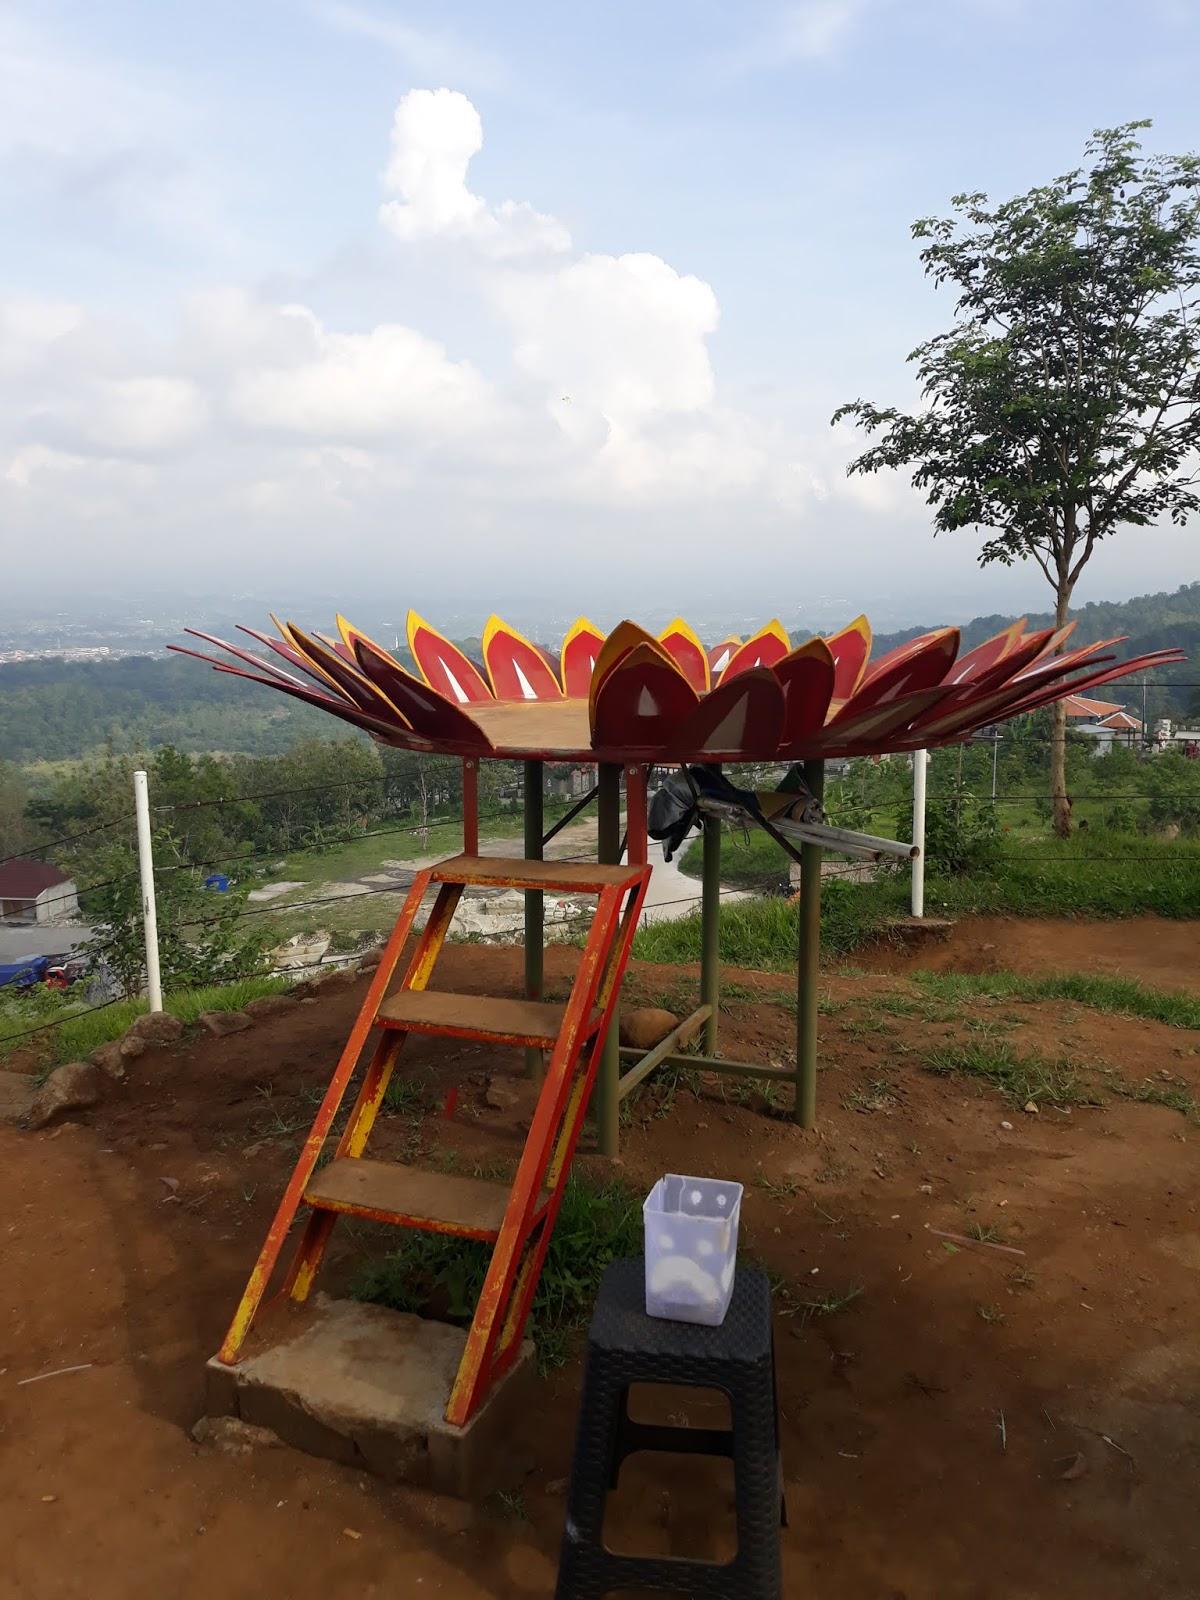 Wisata Alam Tebing Breksi, Desa Sambirejo, Kecamatan ...